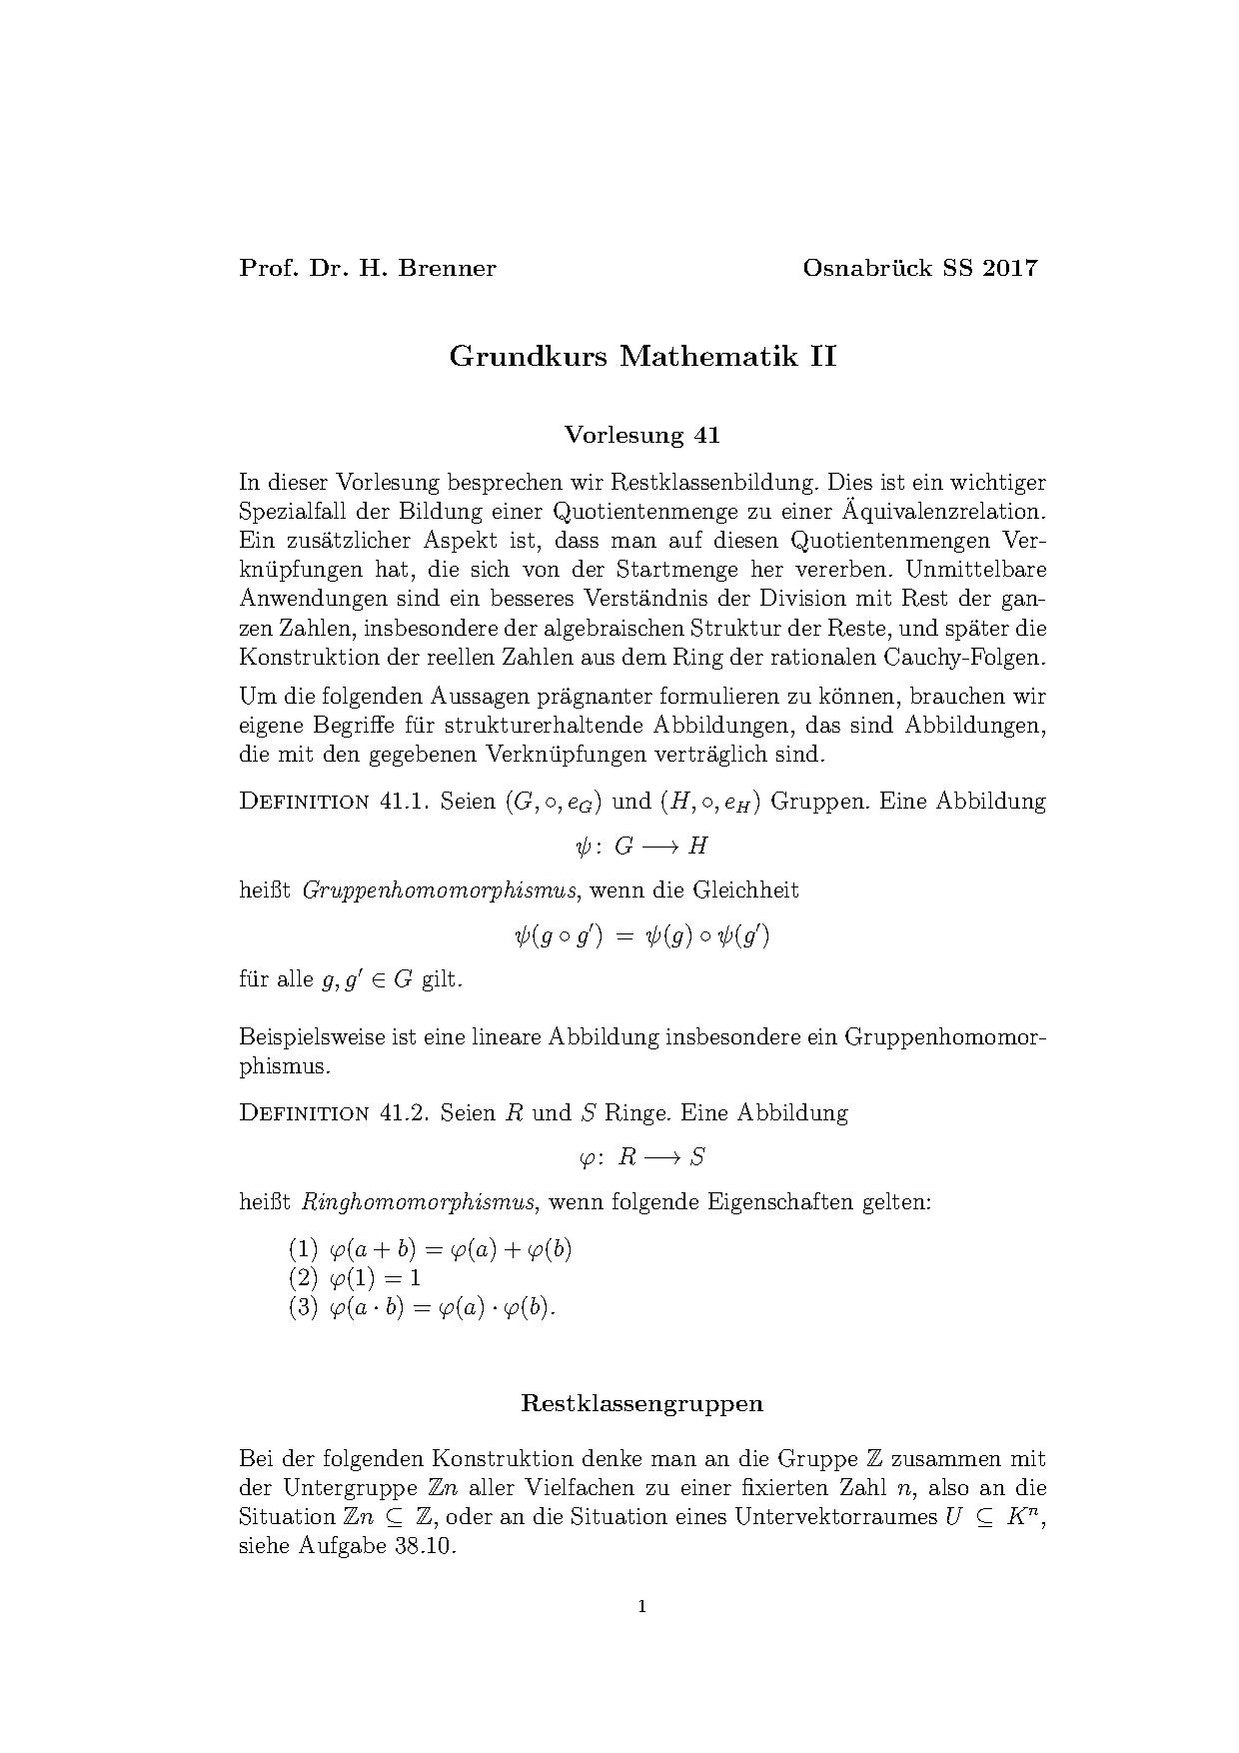 File:Grundkurs Mathematik (Osnabrück 2016-2017)Teil IIVorlesung41 ...